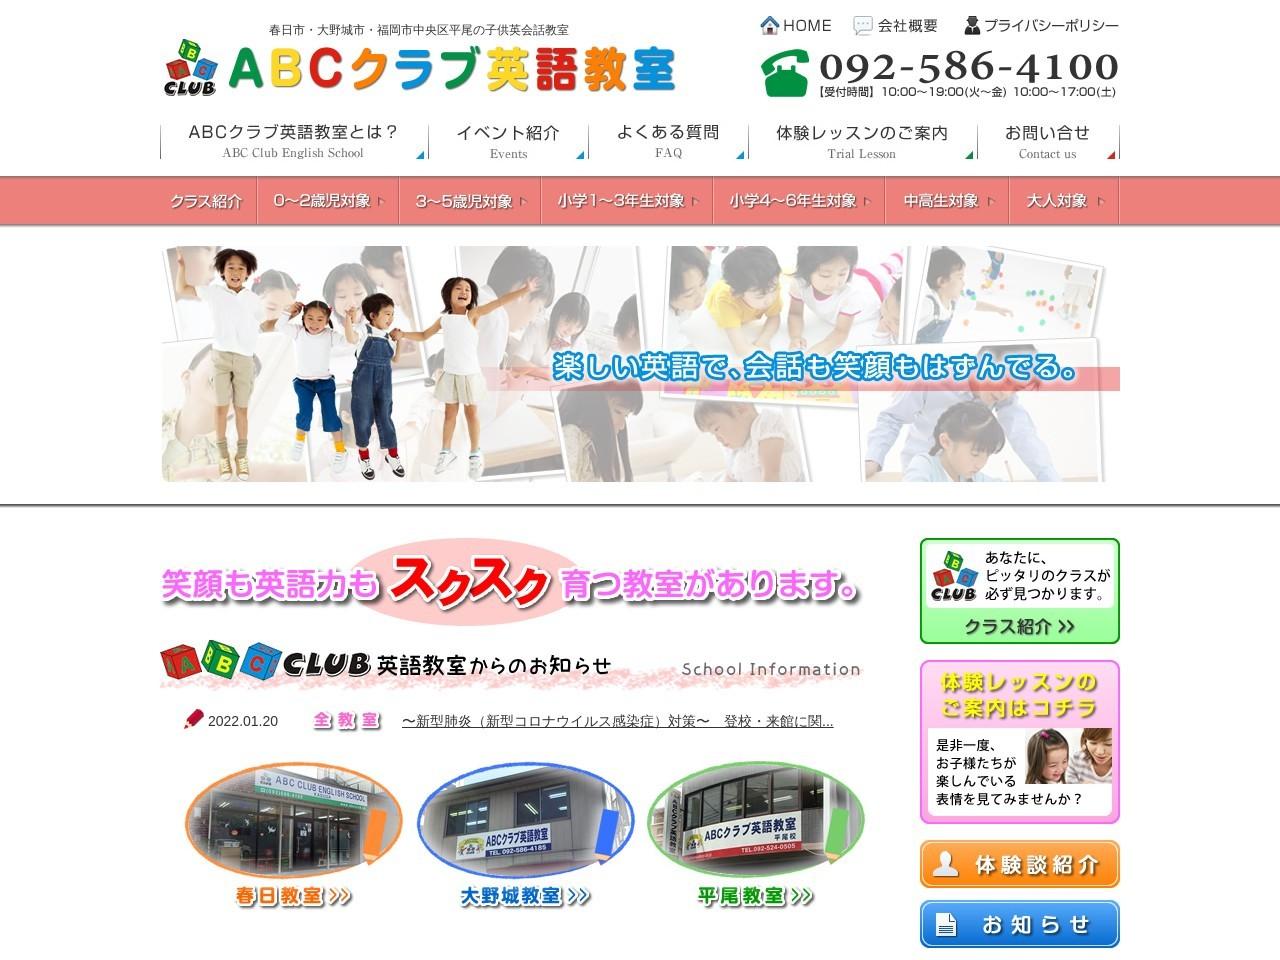 ABCクラブ英語教室春日校